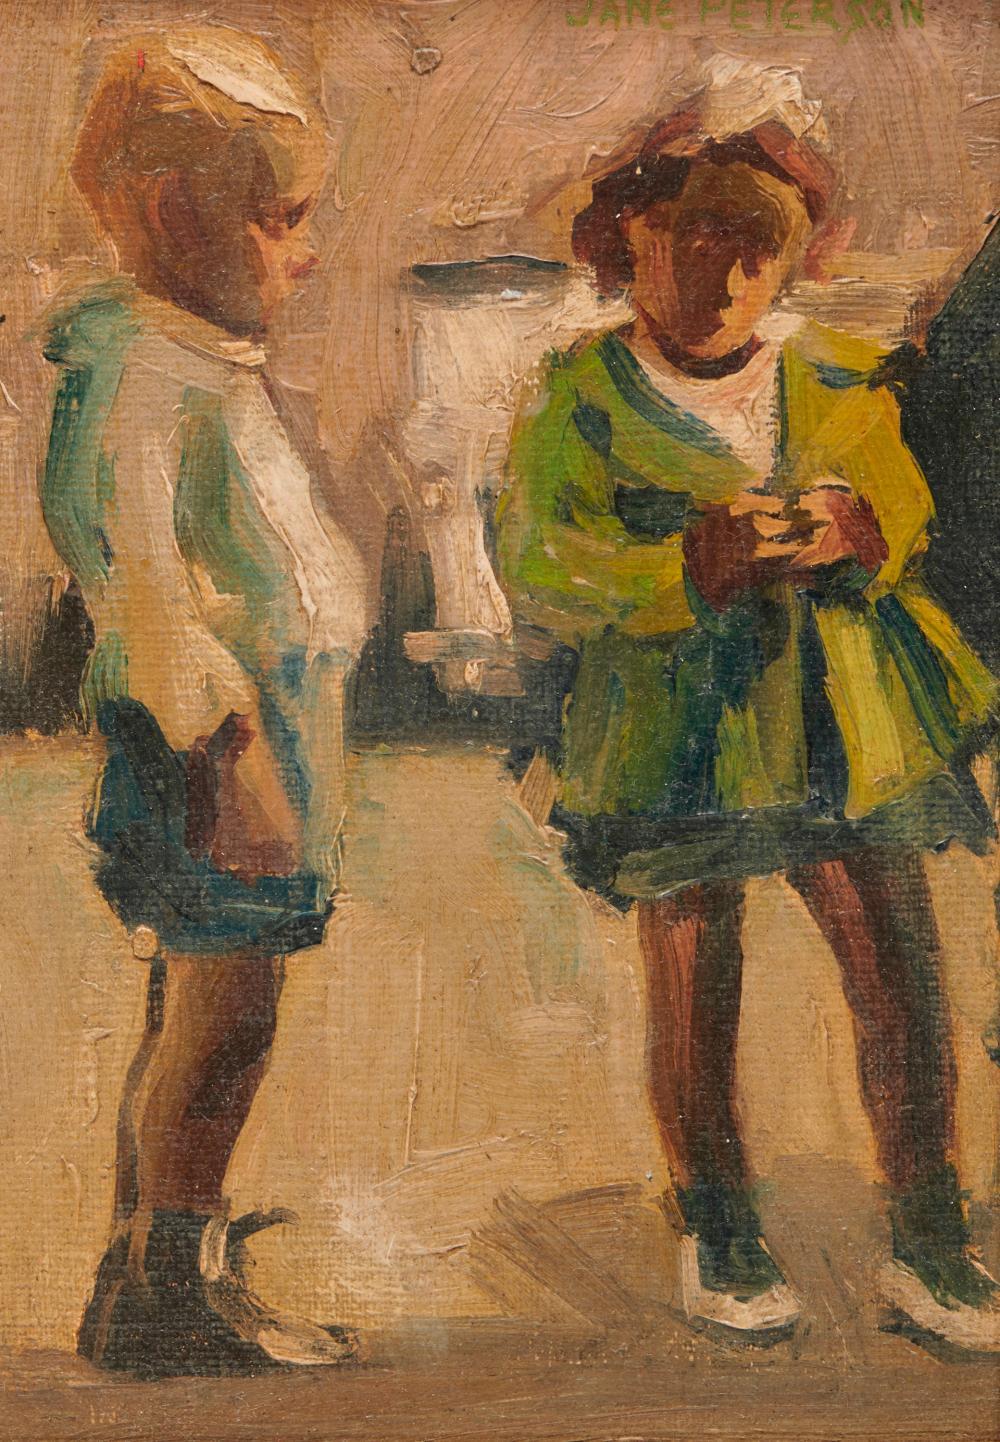 JANE PETERSON, (American, 1876-1965), Two Children, oil on canvasboard, 8 1/2 x 6 in., frame: 14 1/2 x 12 in.